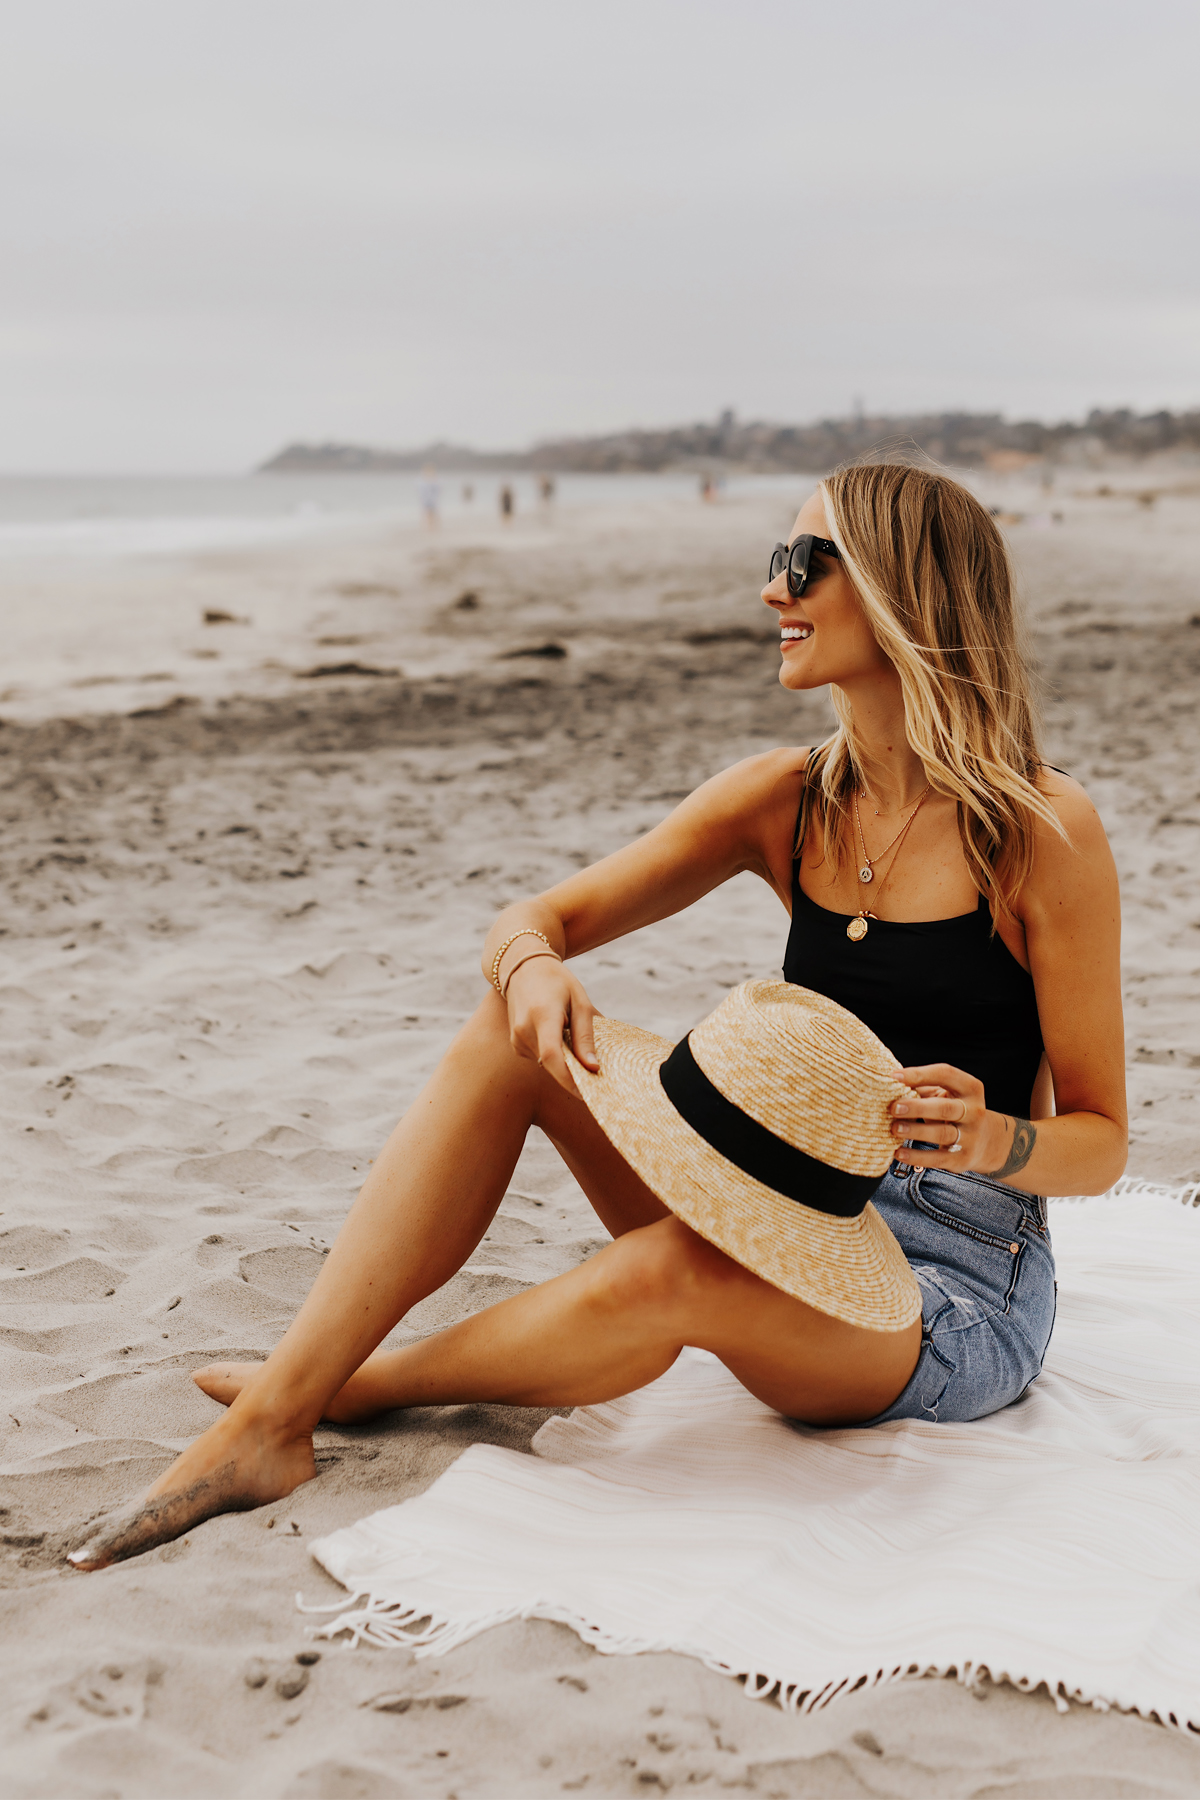 Fashion Jackson Wearing L Space Black One Piece Swimsuit Denim Shorts Brixton Straw Hat San Diego Beach Weekend